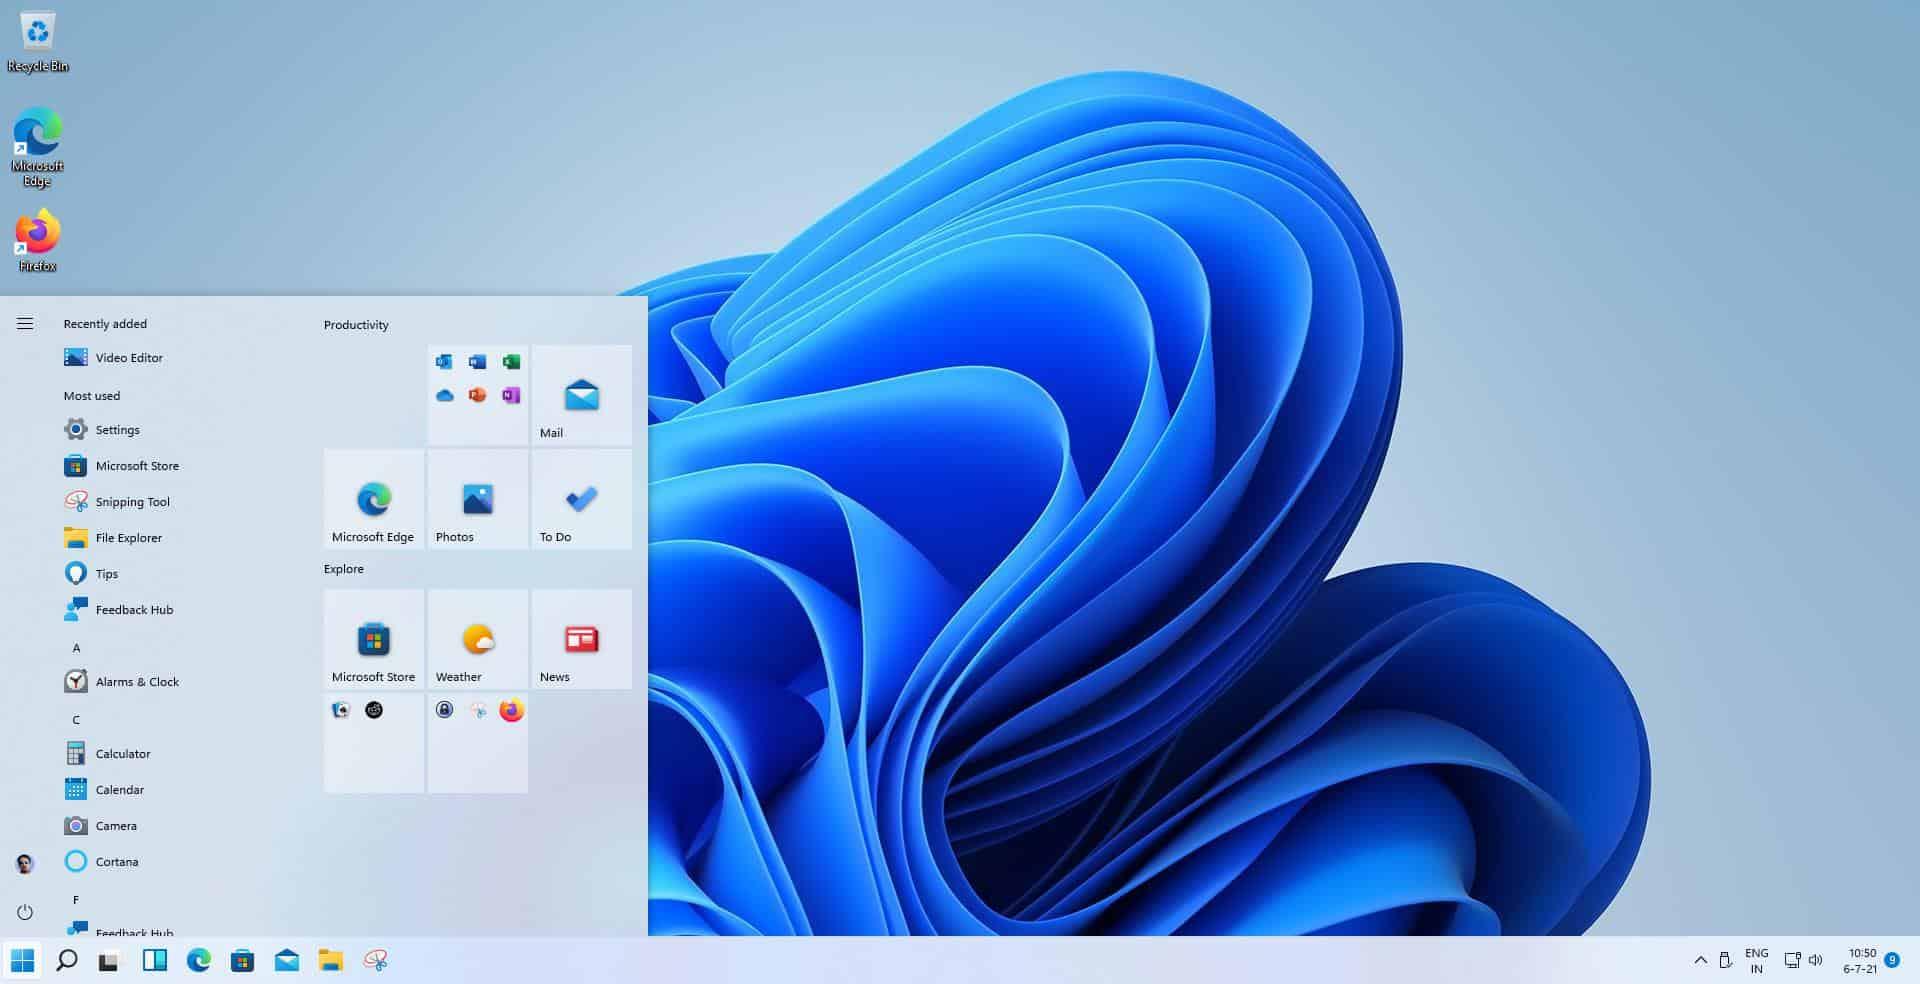 Restore the Windows 10 Start Menu in Windows 11 with TenStartMenuFixer